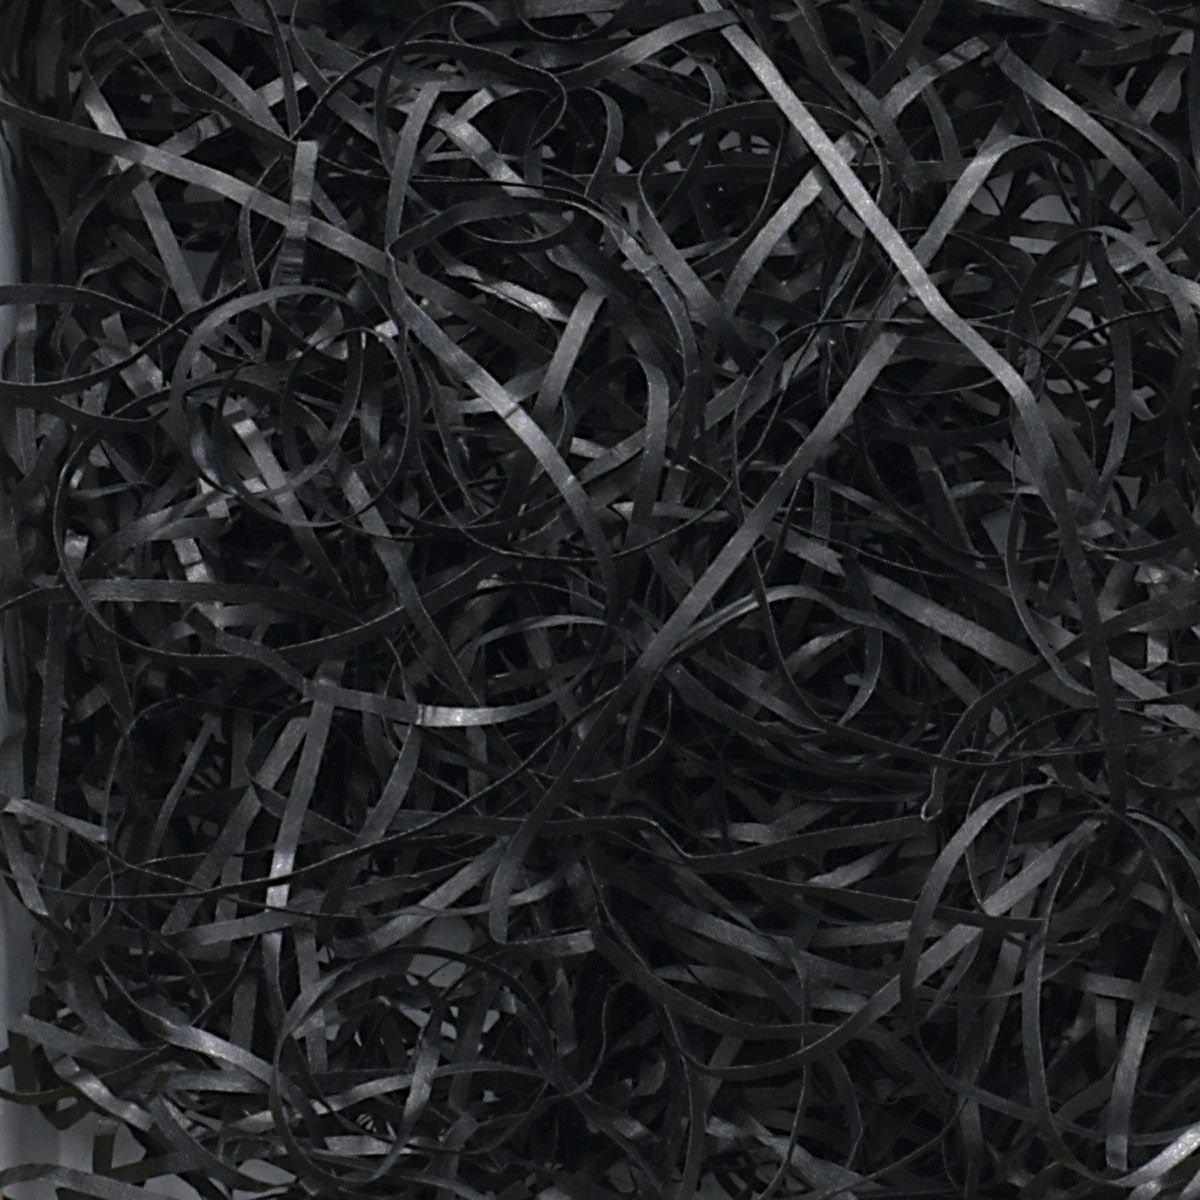 200g Shredded Paper - Black SizzlePak